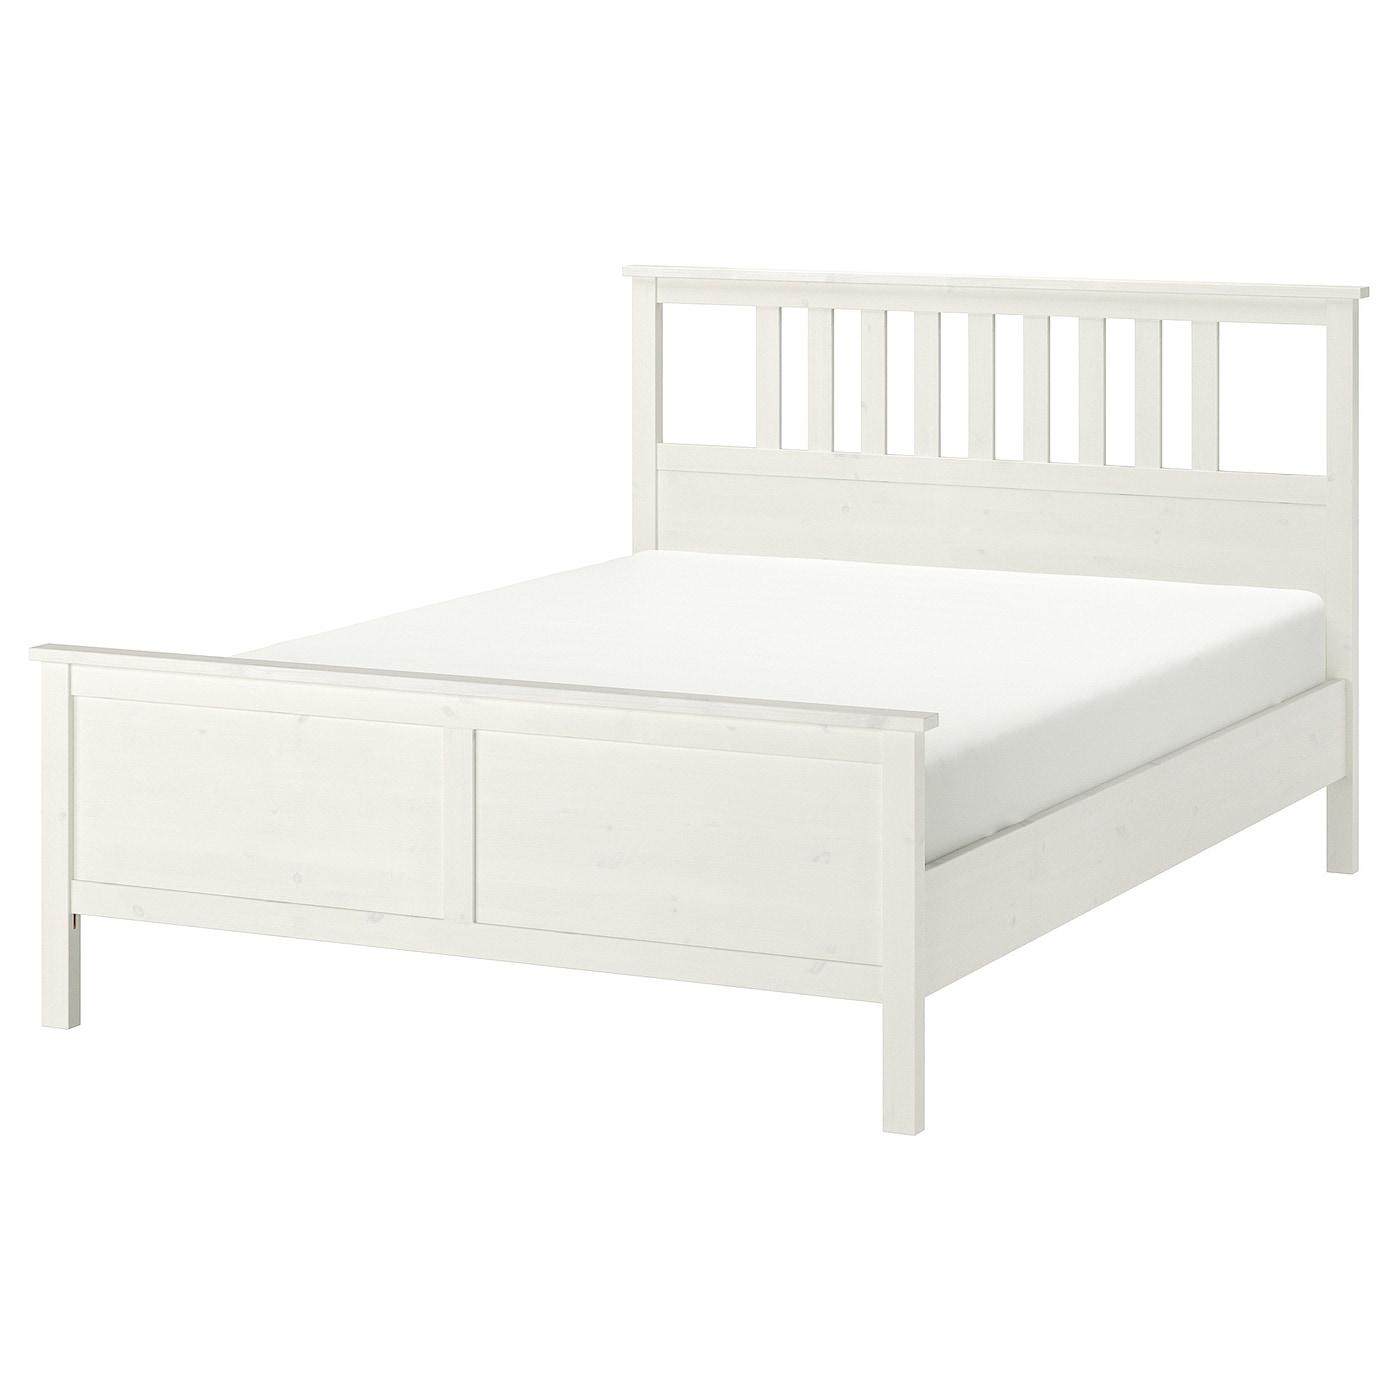 HEMNES Bed frame, white stain, Luröy, Queen - IKEA